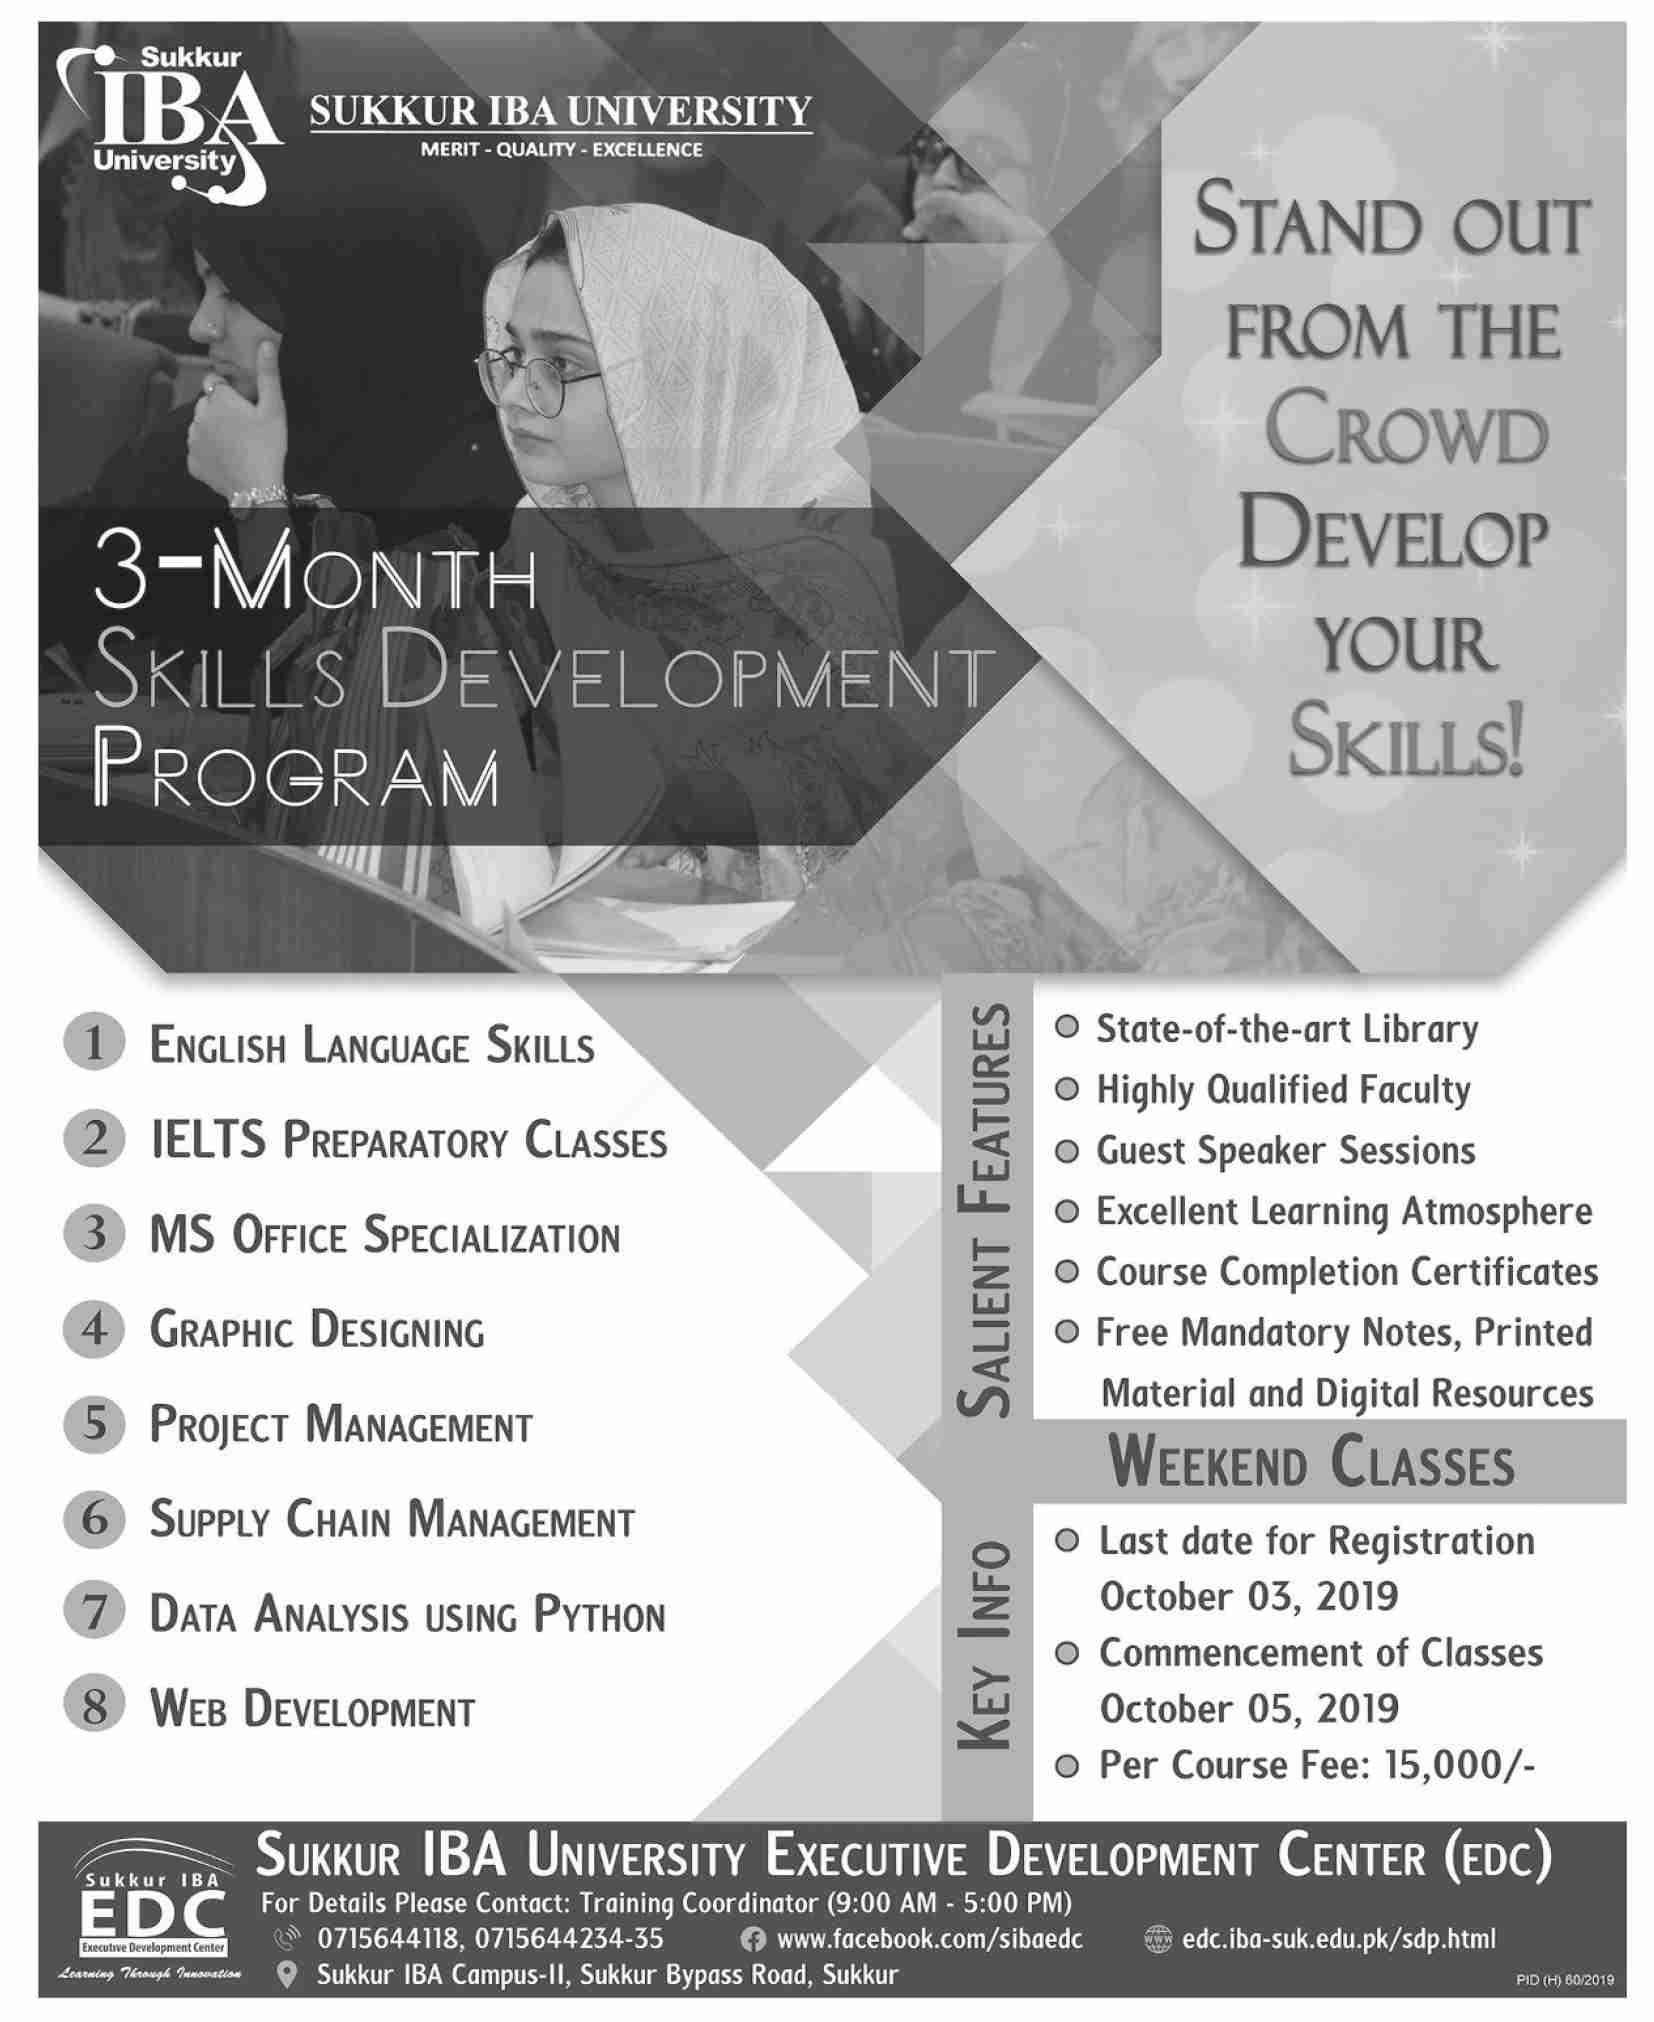 Sukkur IBA University 3 Month Skills Development Program